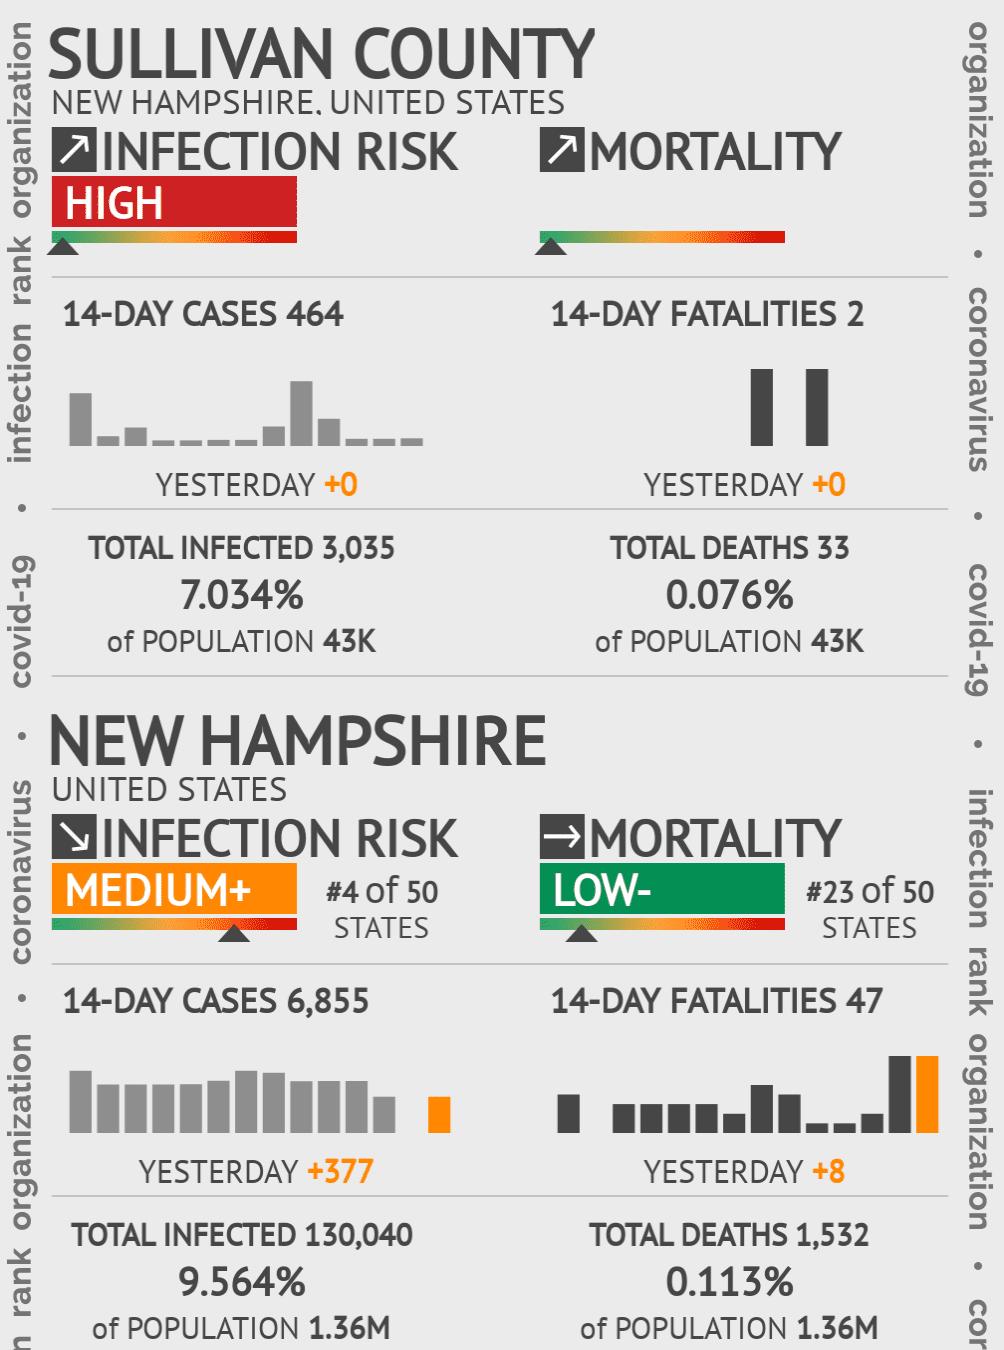 Sullivan County Coronavirus Covid-19 Risk of Infection on July 24, 2021